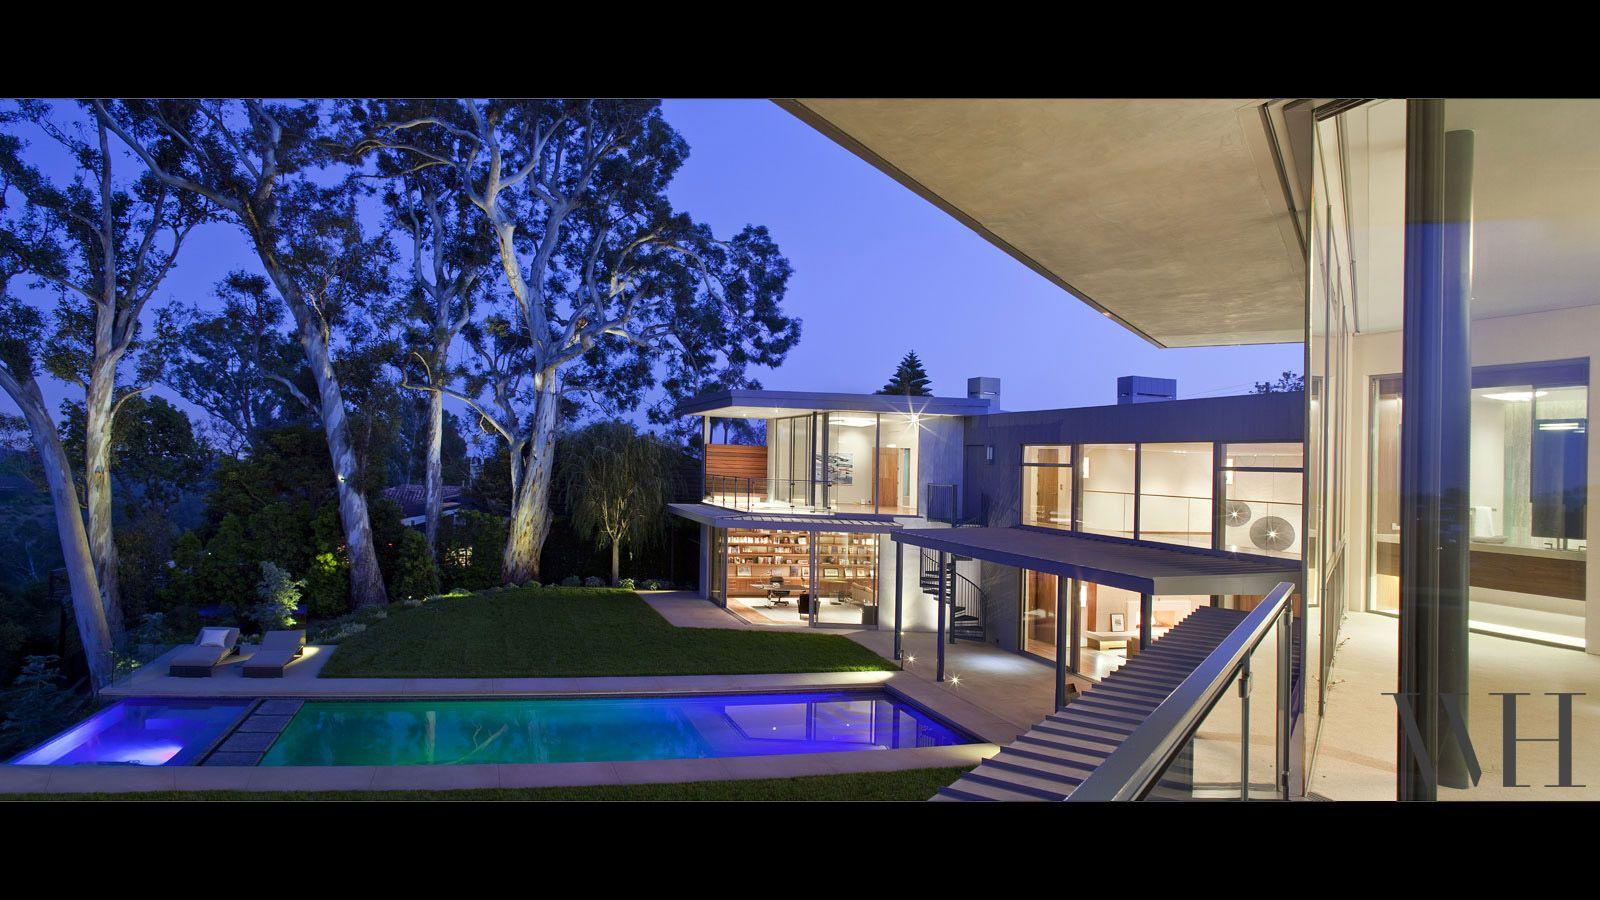 Chautauqua Residence by Studio William Hefner | Contemporary ...